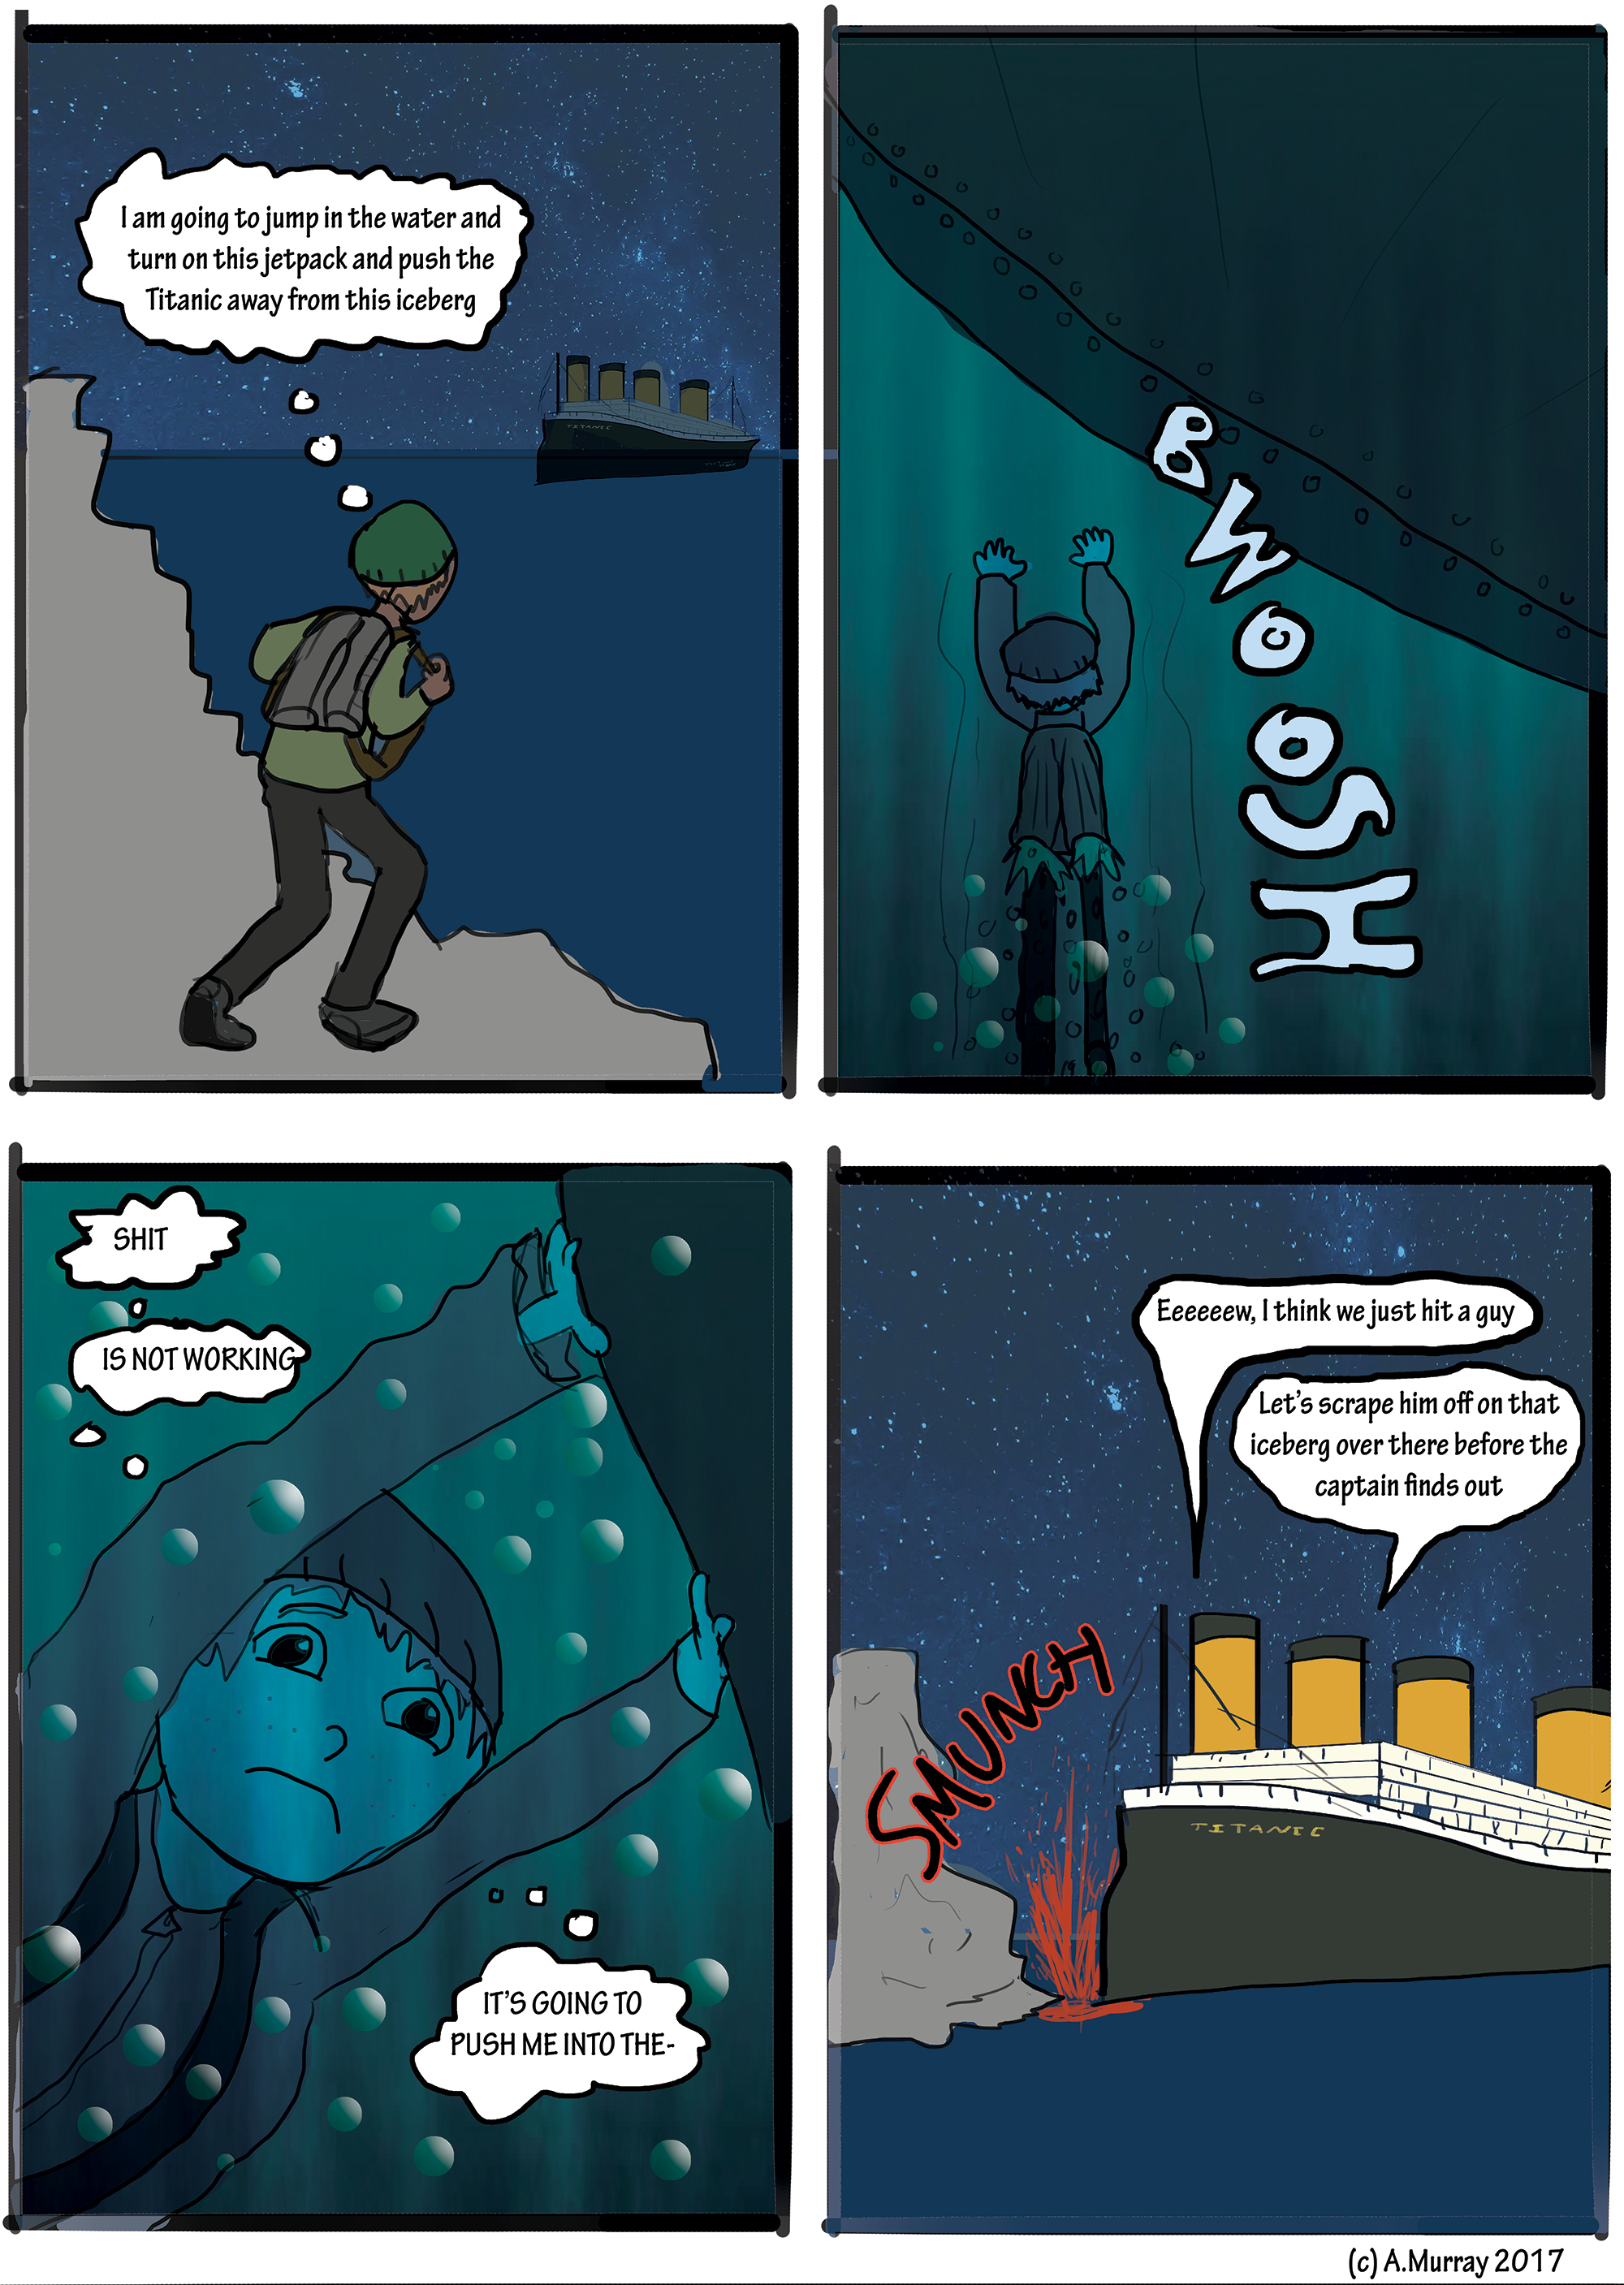 Qwerty Saves the Titanic